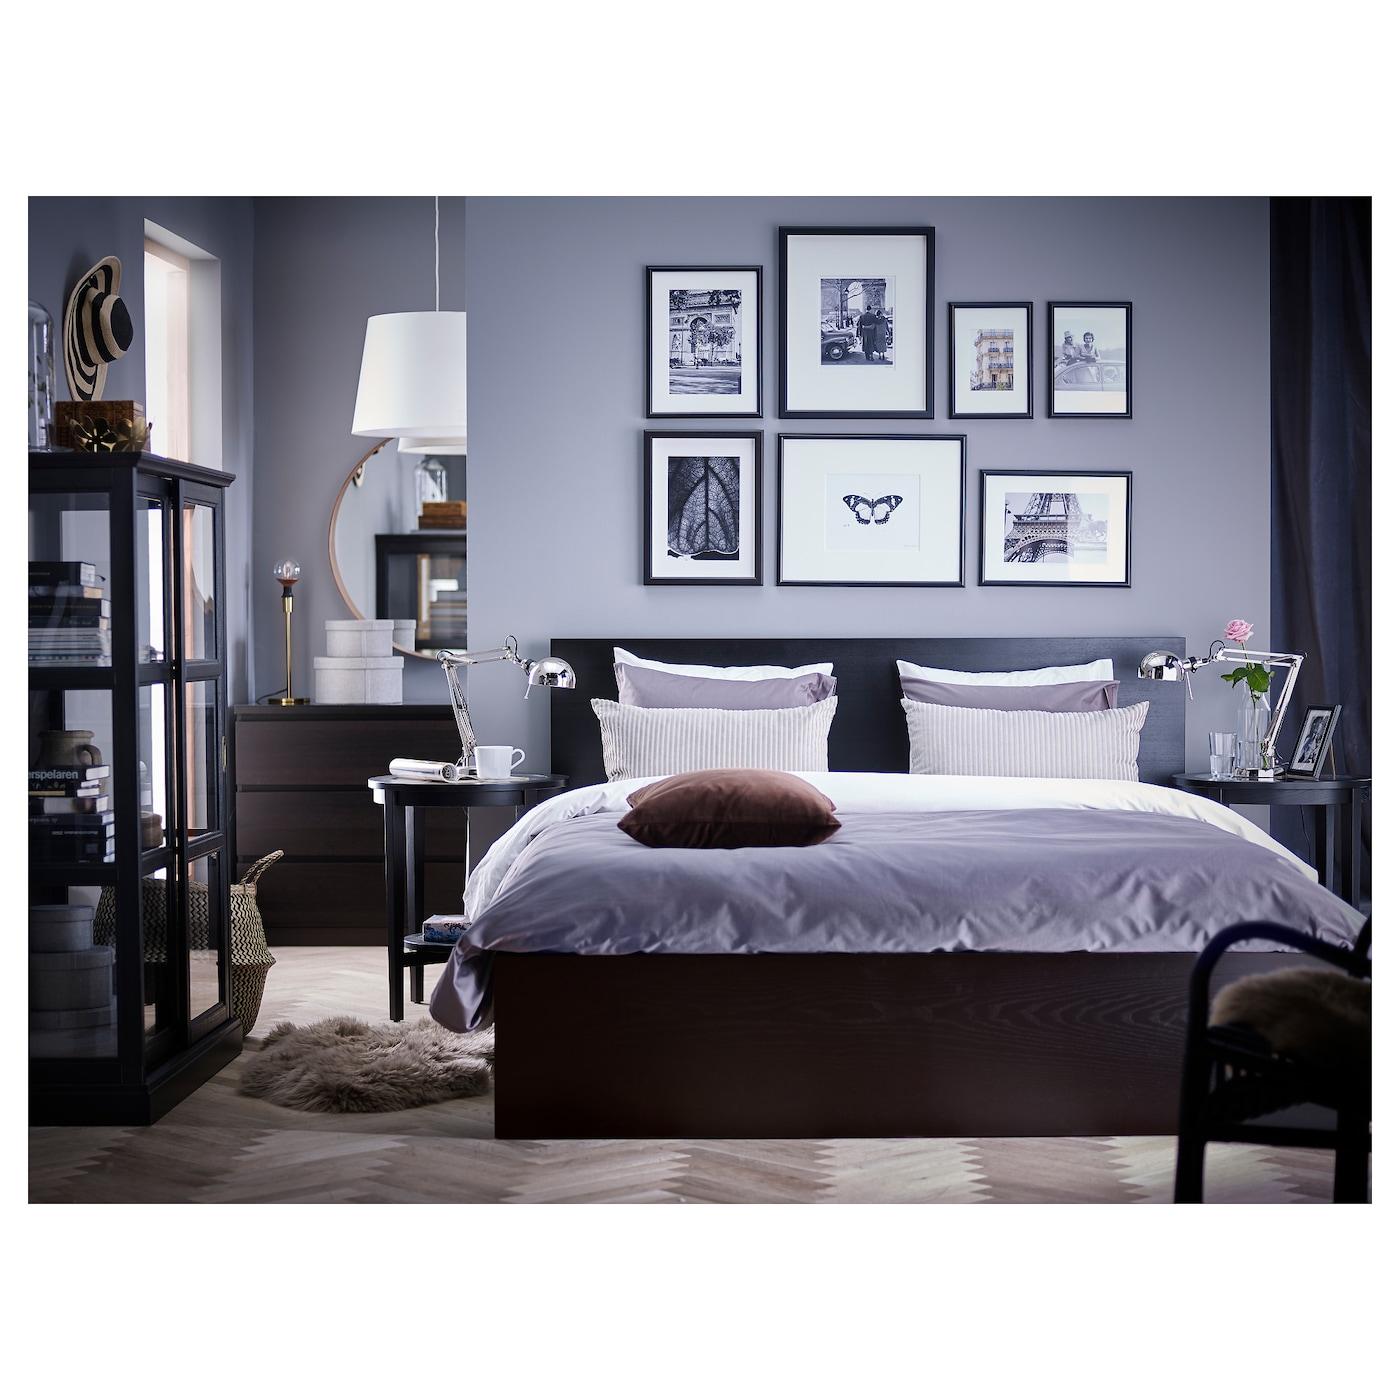 malm cadre de lit haut brun noir leirsund 160 x 200 cm ikea. Black Bedroom Furniture Sets. Home Design Ideas